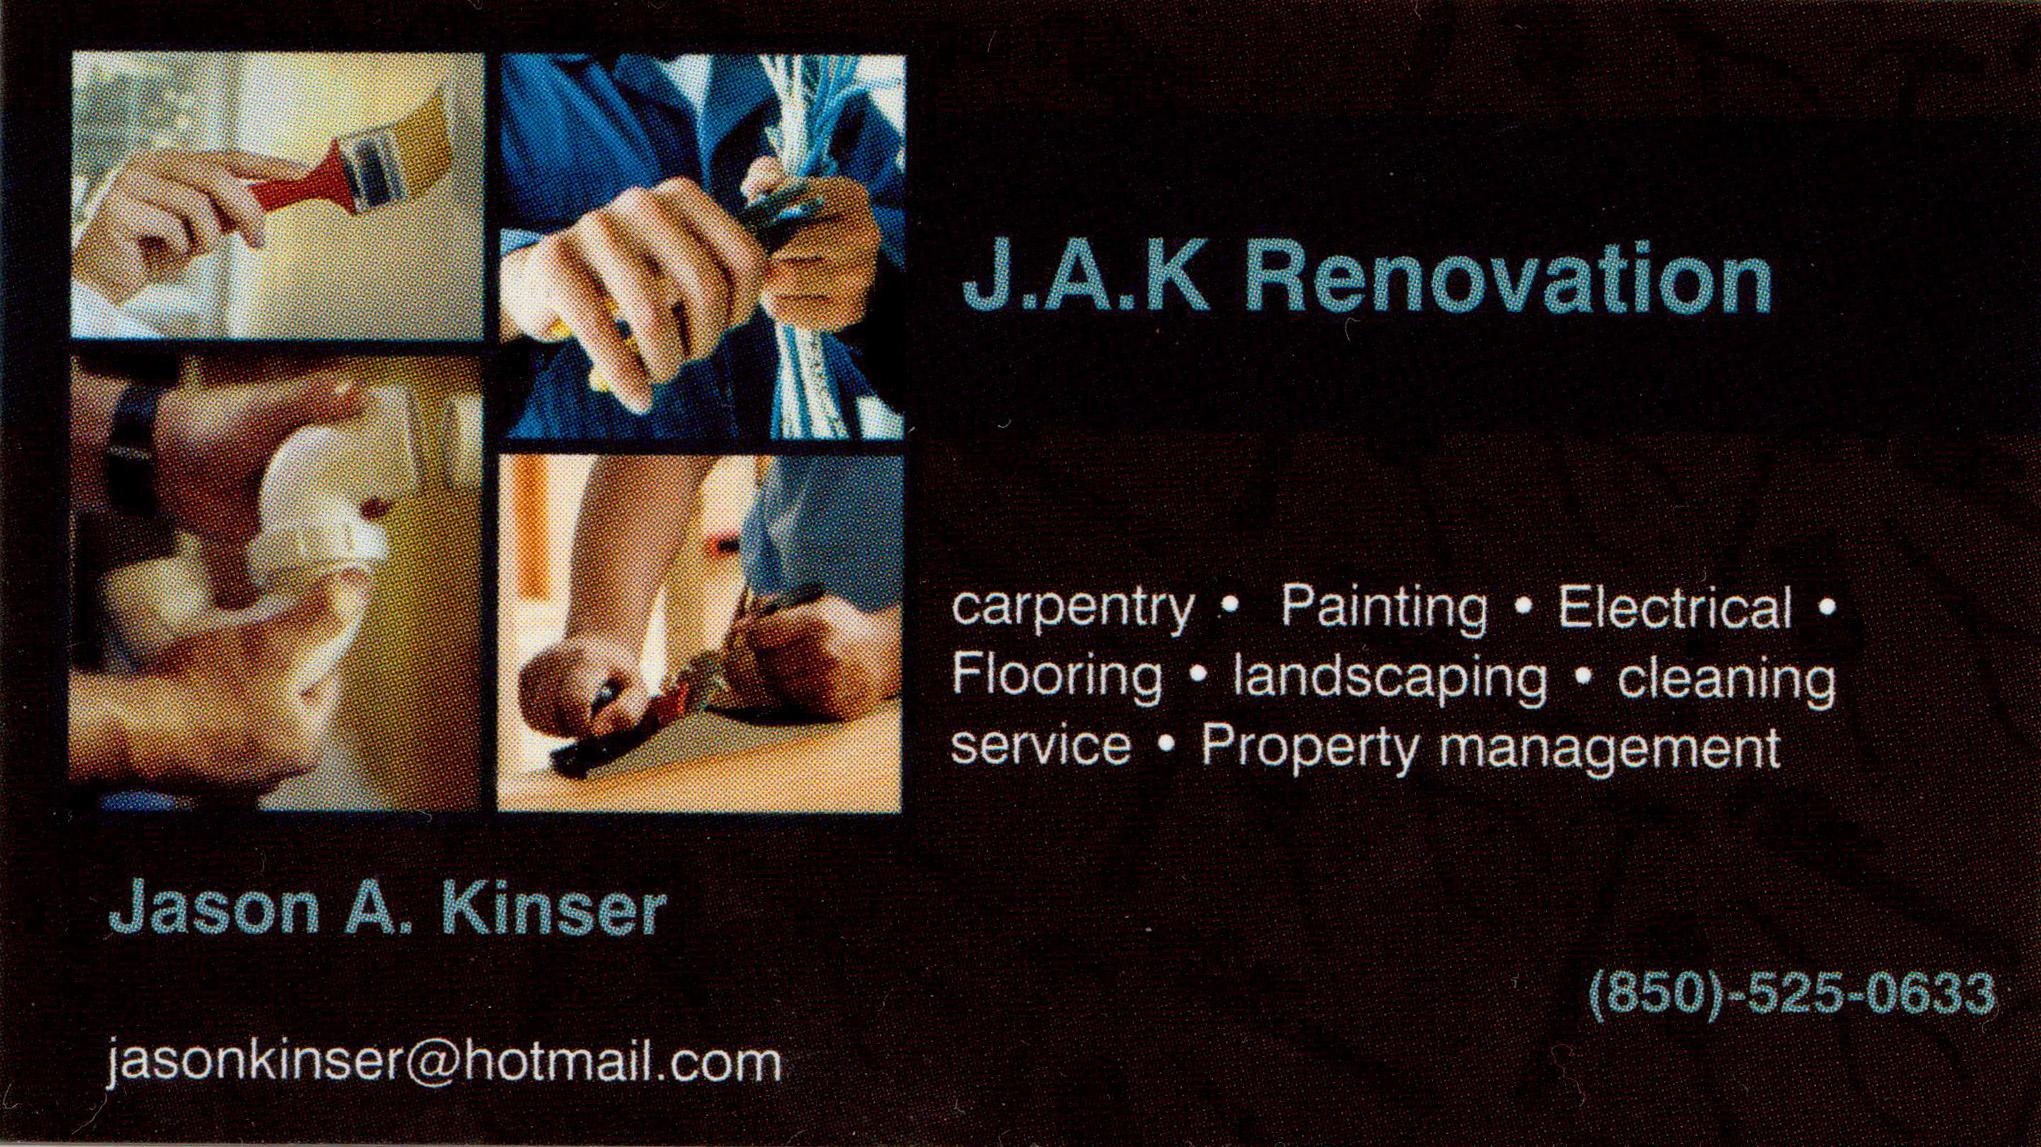 J A K Renovation Handyman Cleaning Service 5704 E S Dr Pensacola Fl 32505 Yp